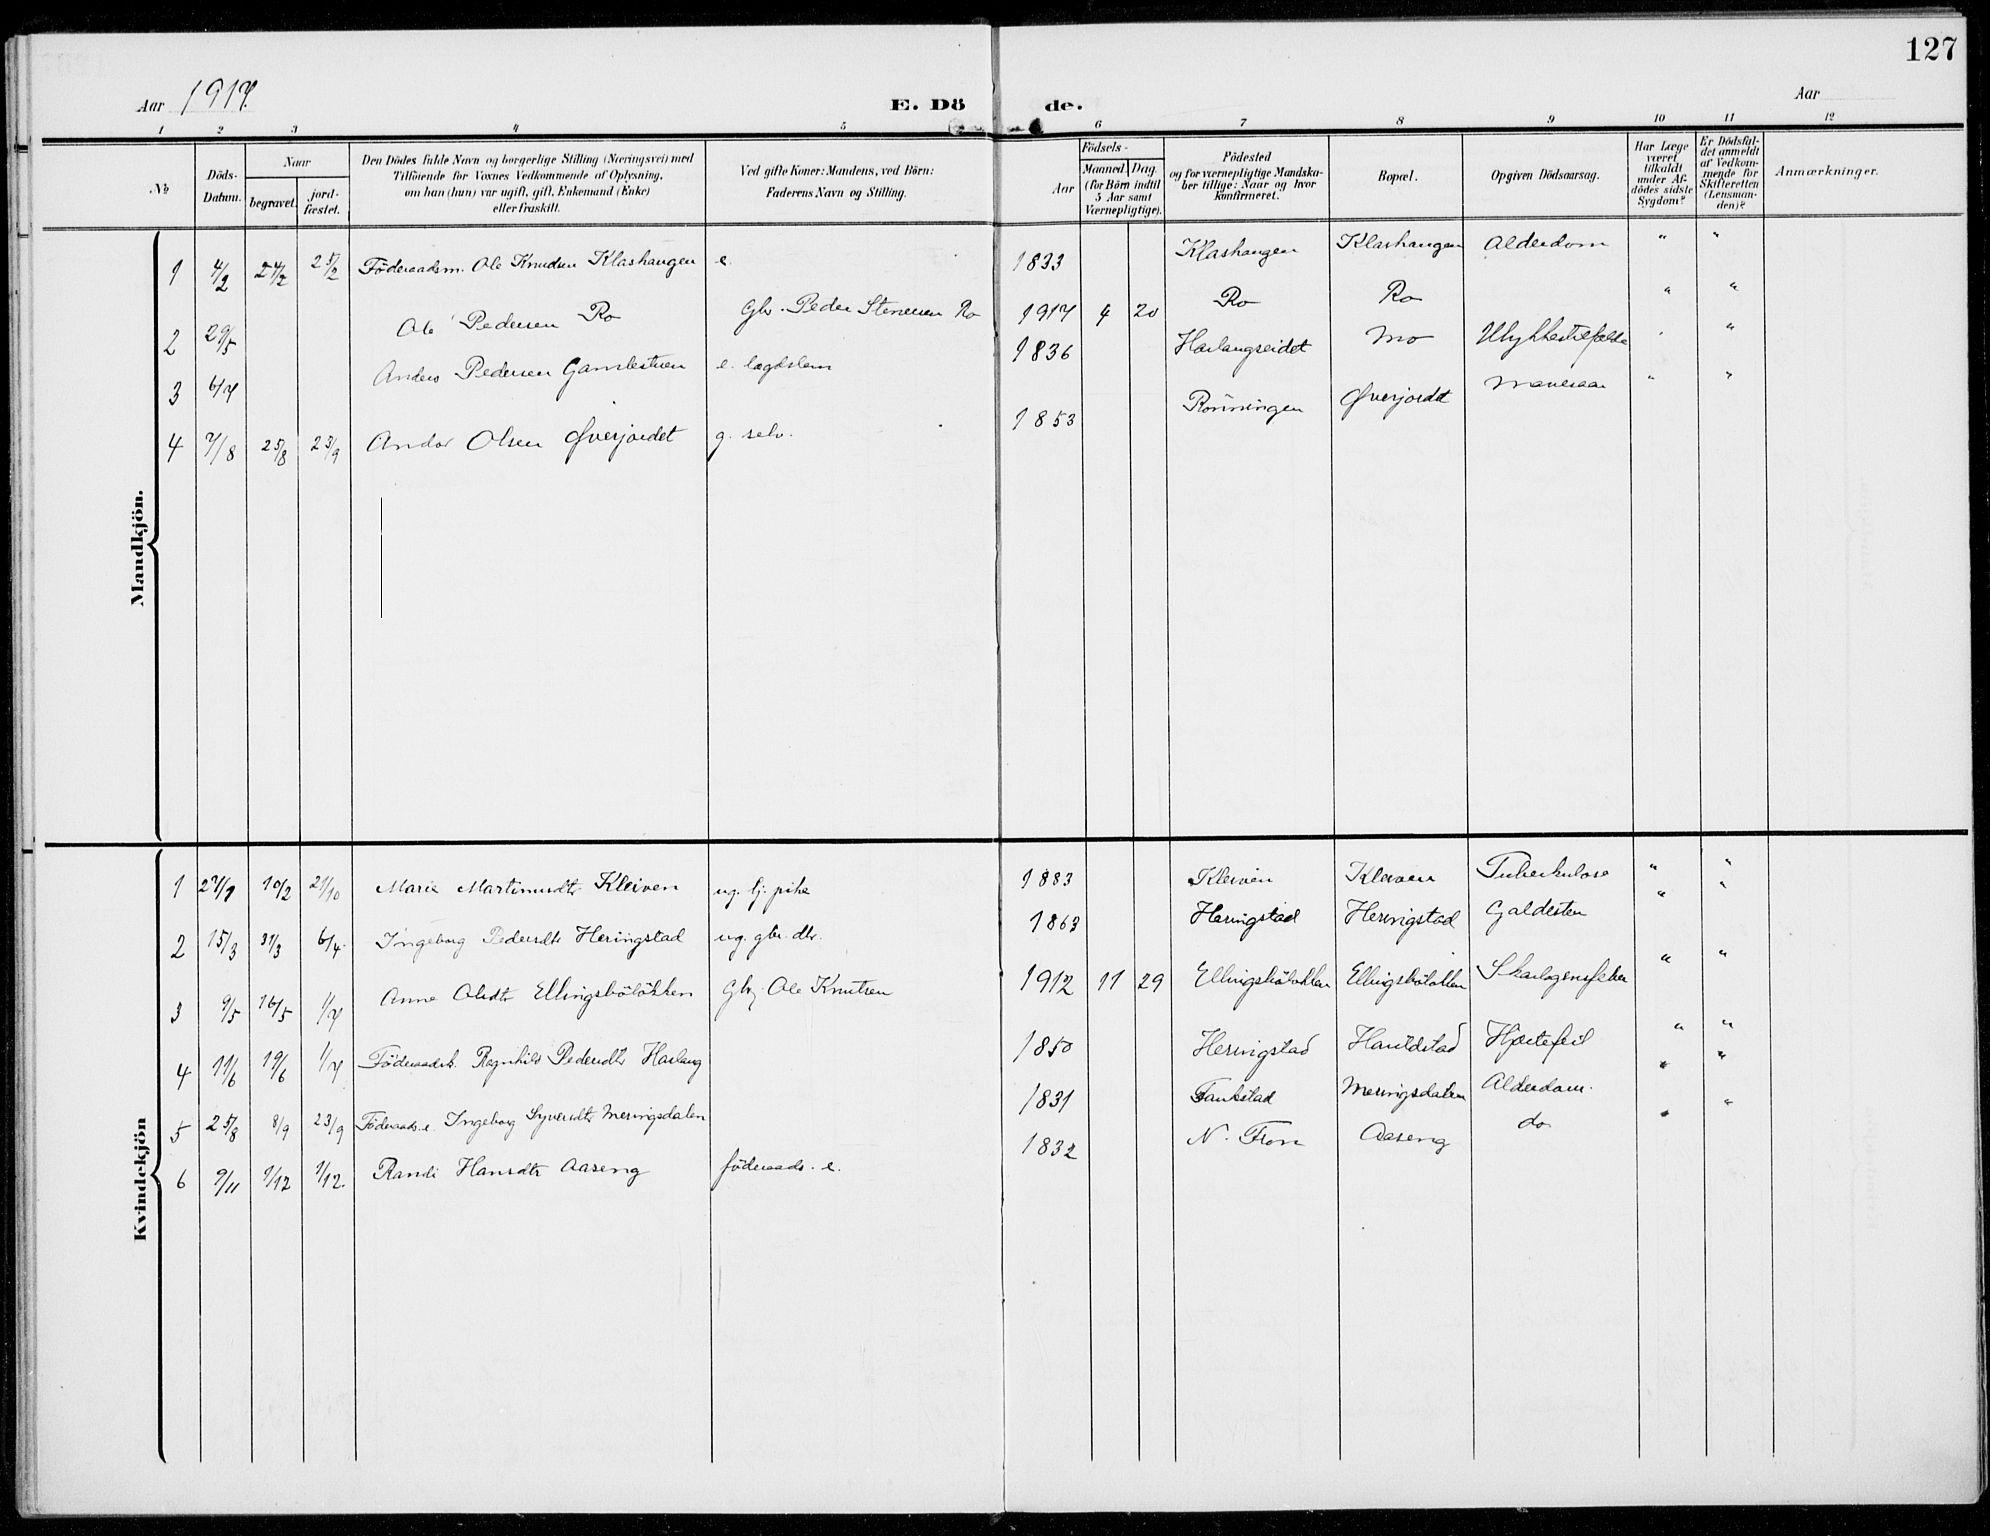 SAH, Sel prestekontor, Ministerialbok nr. 1, 1905-1922, s. 127